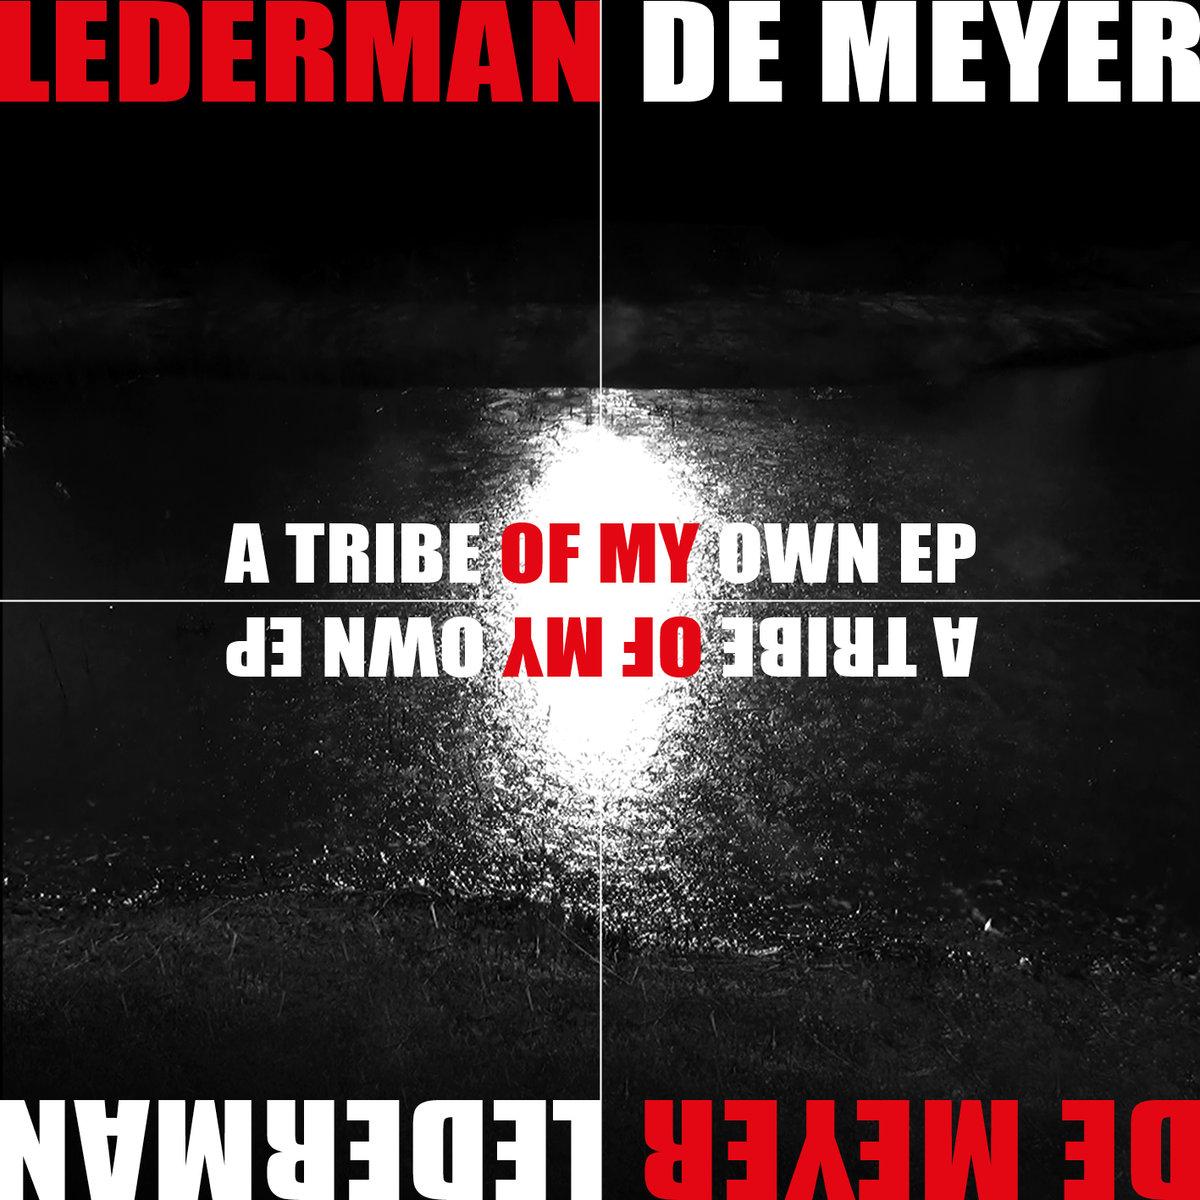 Lederman / De Meyer - A Tribe Of My Own - Lederman / De Meyer - A Tribe Of My Own